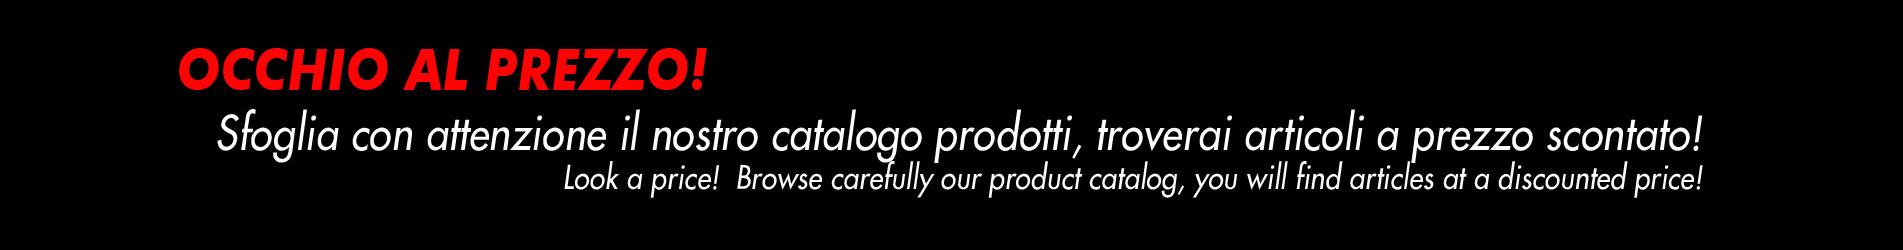 banner promo eng